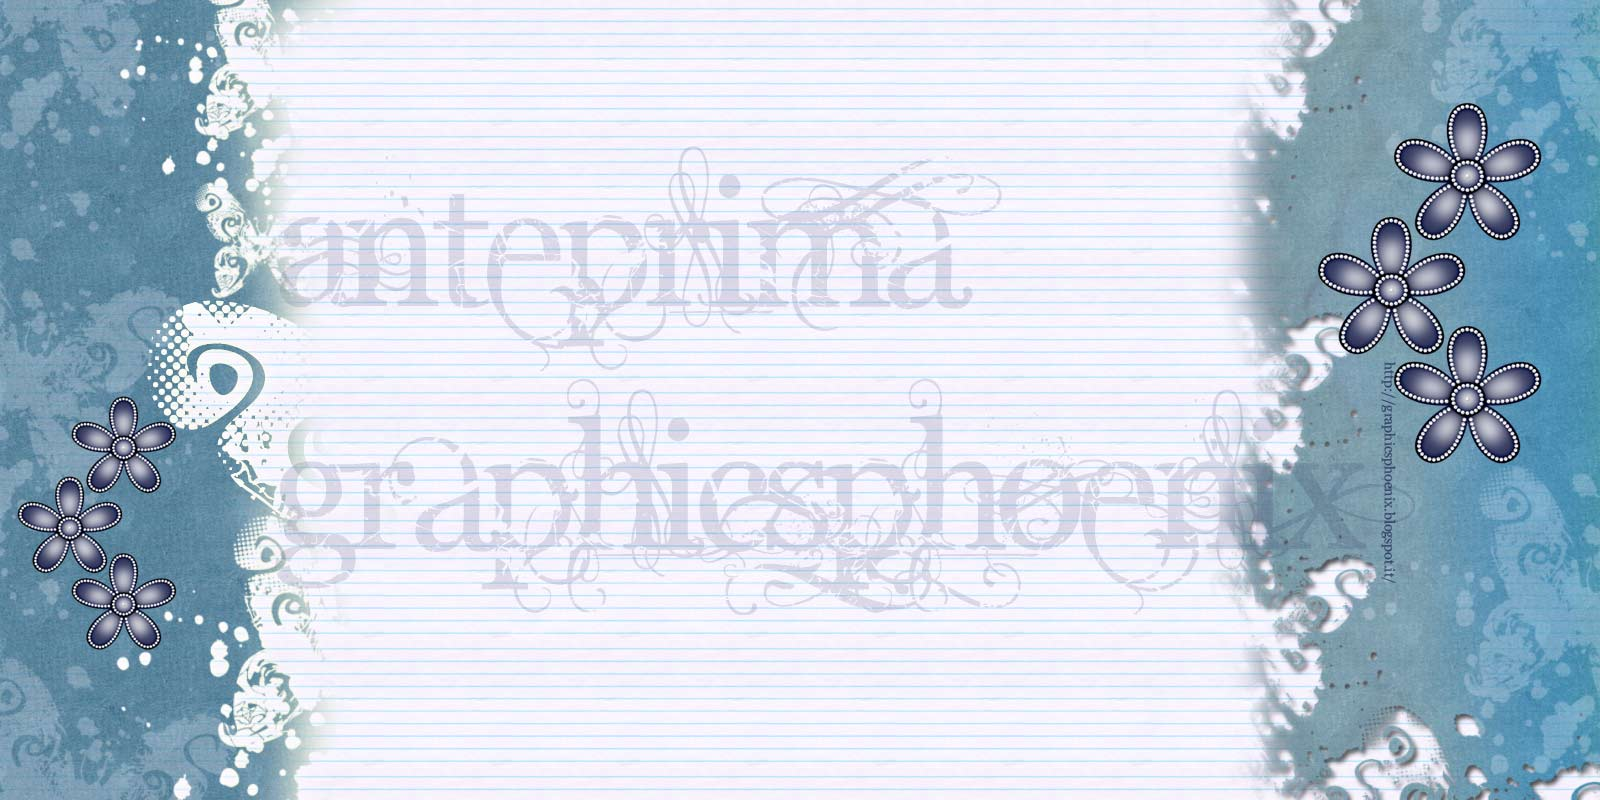 http://3.bp.blogspot.com/-pTFn5a-s7uo/T6LjkJfLp3I/AAAAAAAADbI/W_DqMJNWm60/s1600/20SF2012.jpg